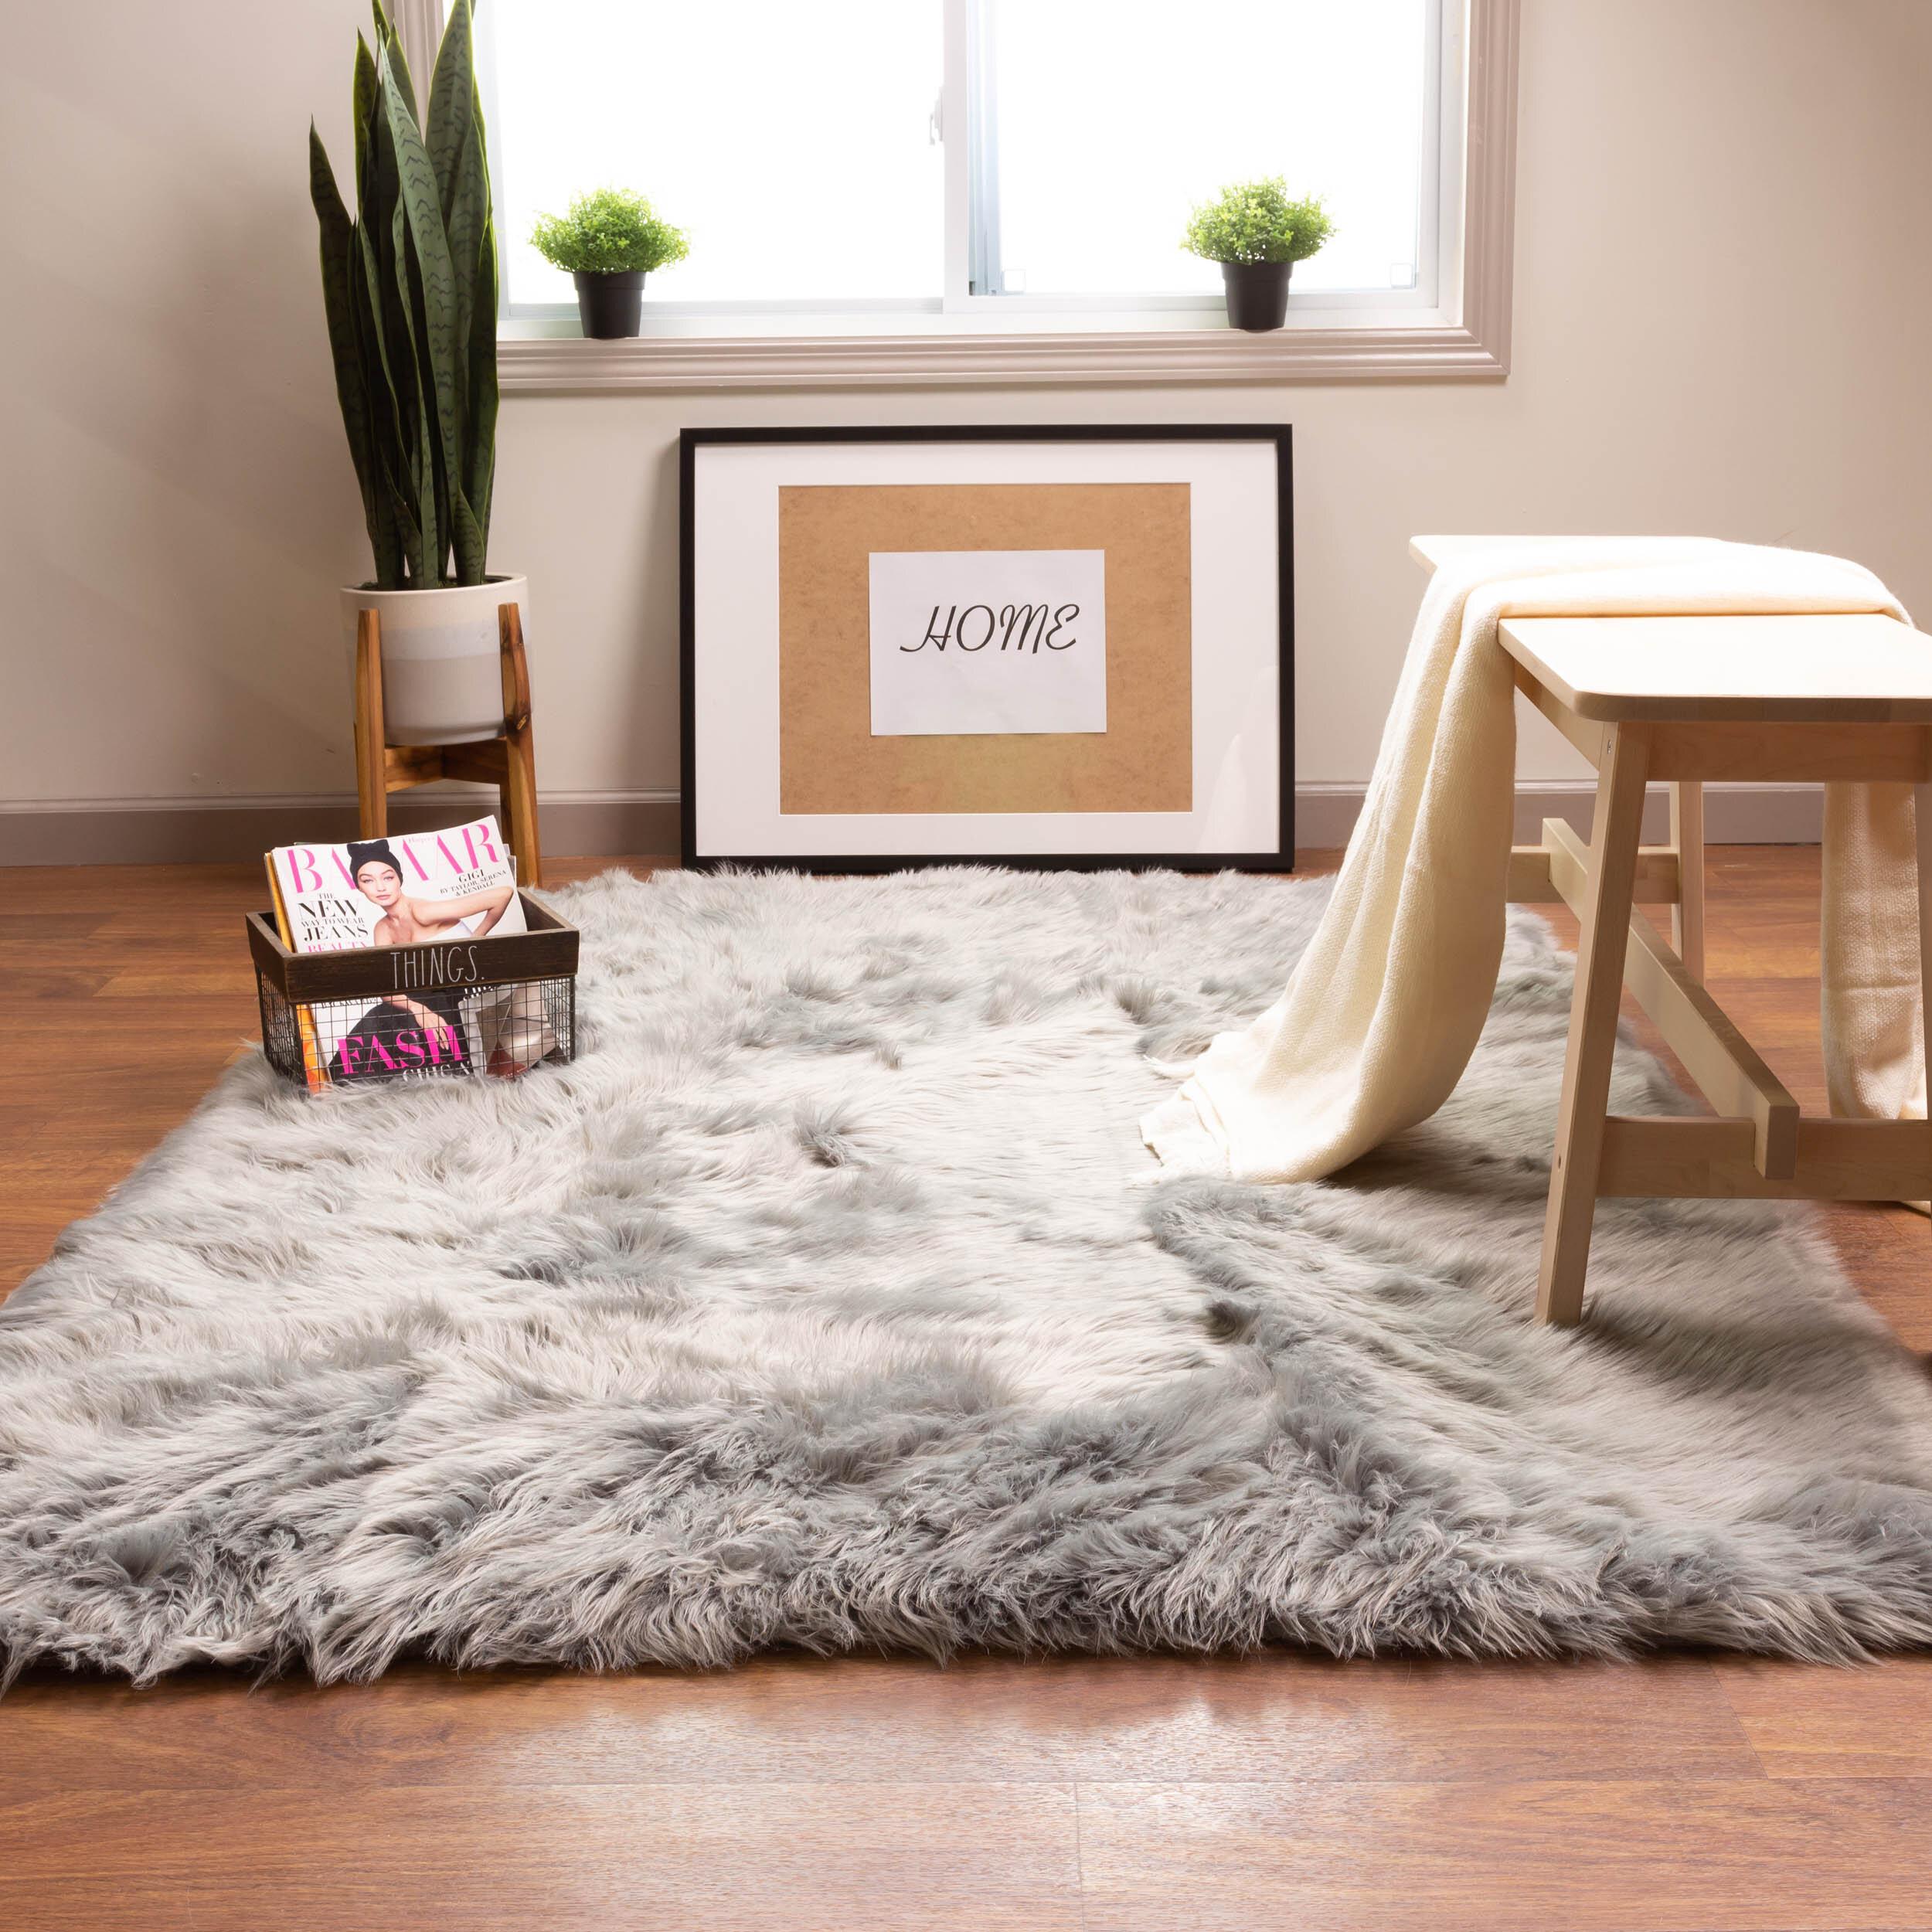 Living Room Rug Deep-Pile Brown Soft Shaggy Durable Shag-Pile Robust